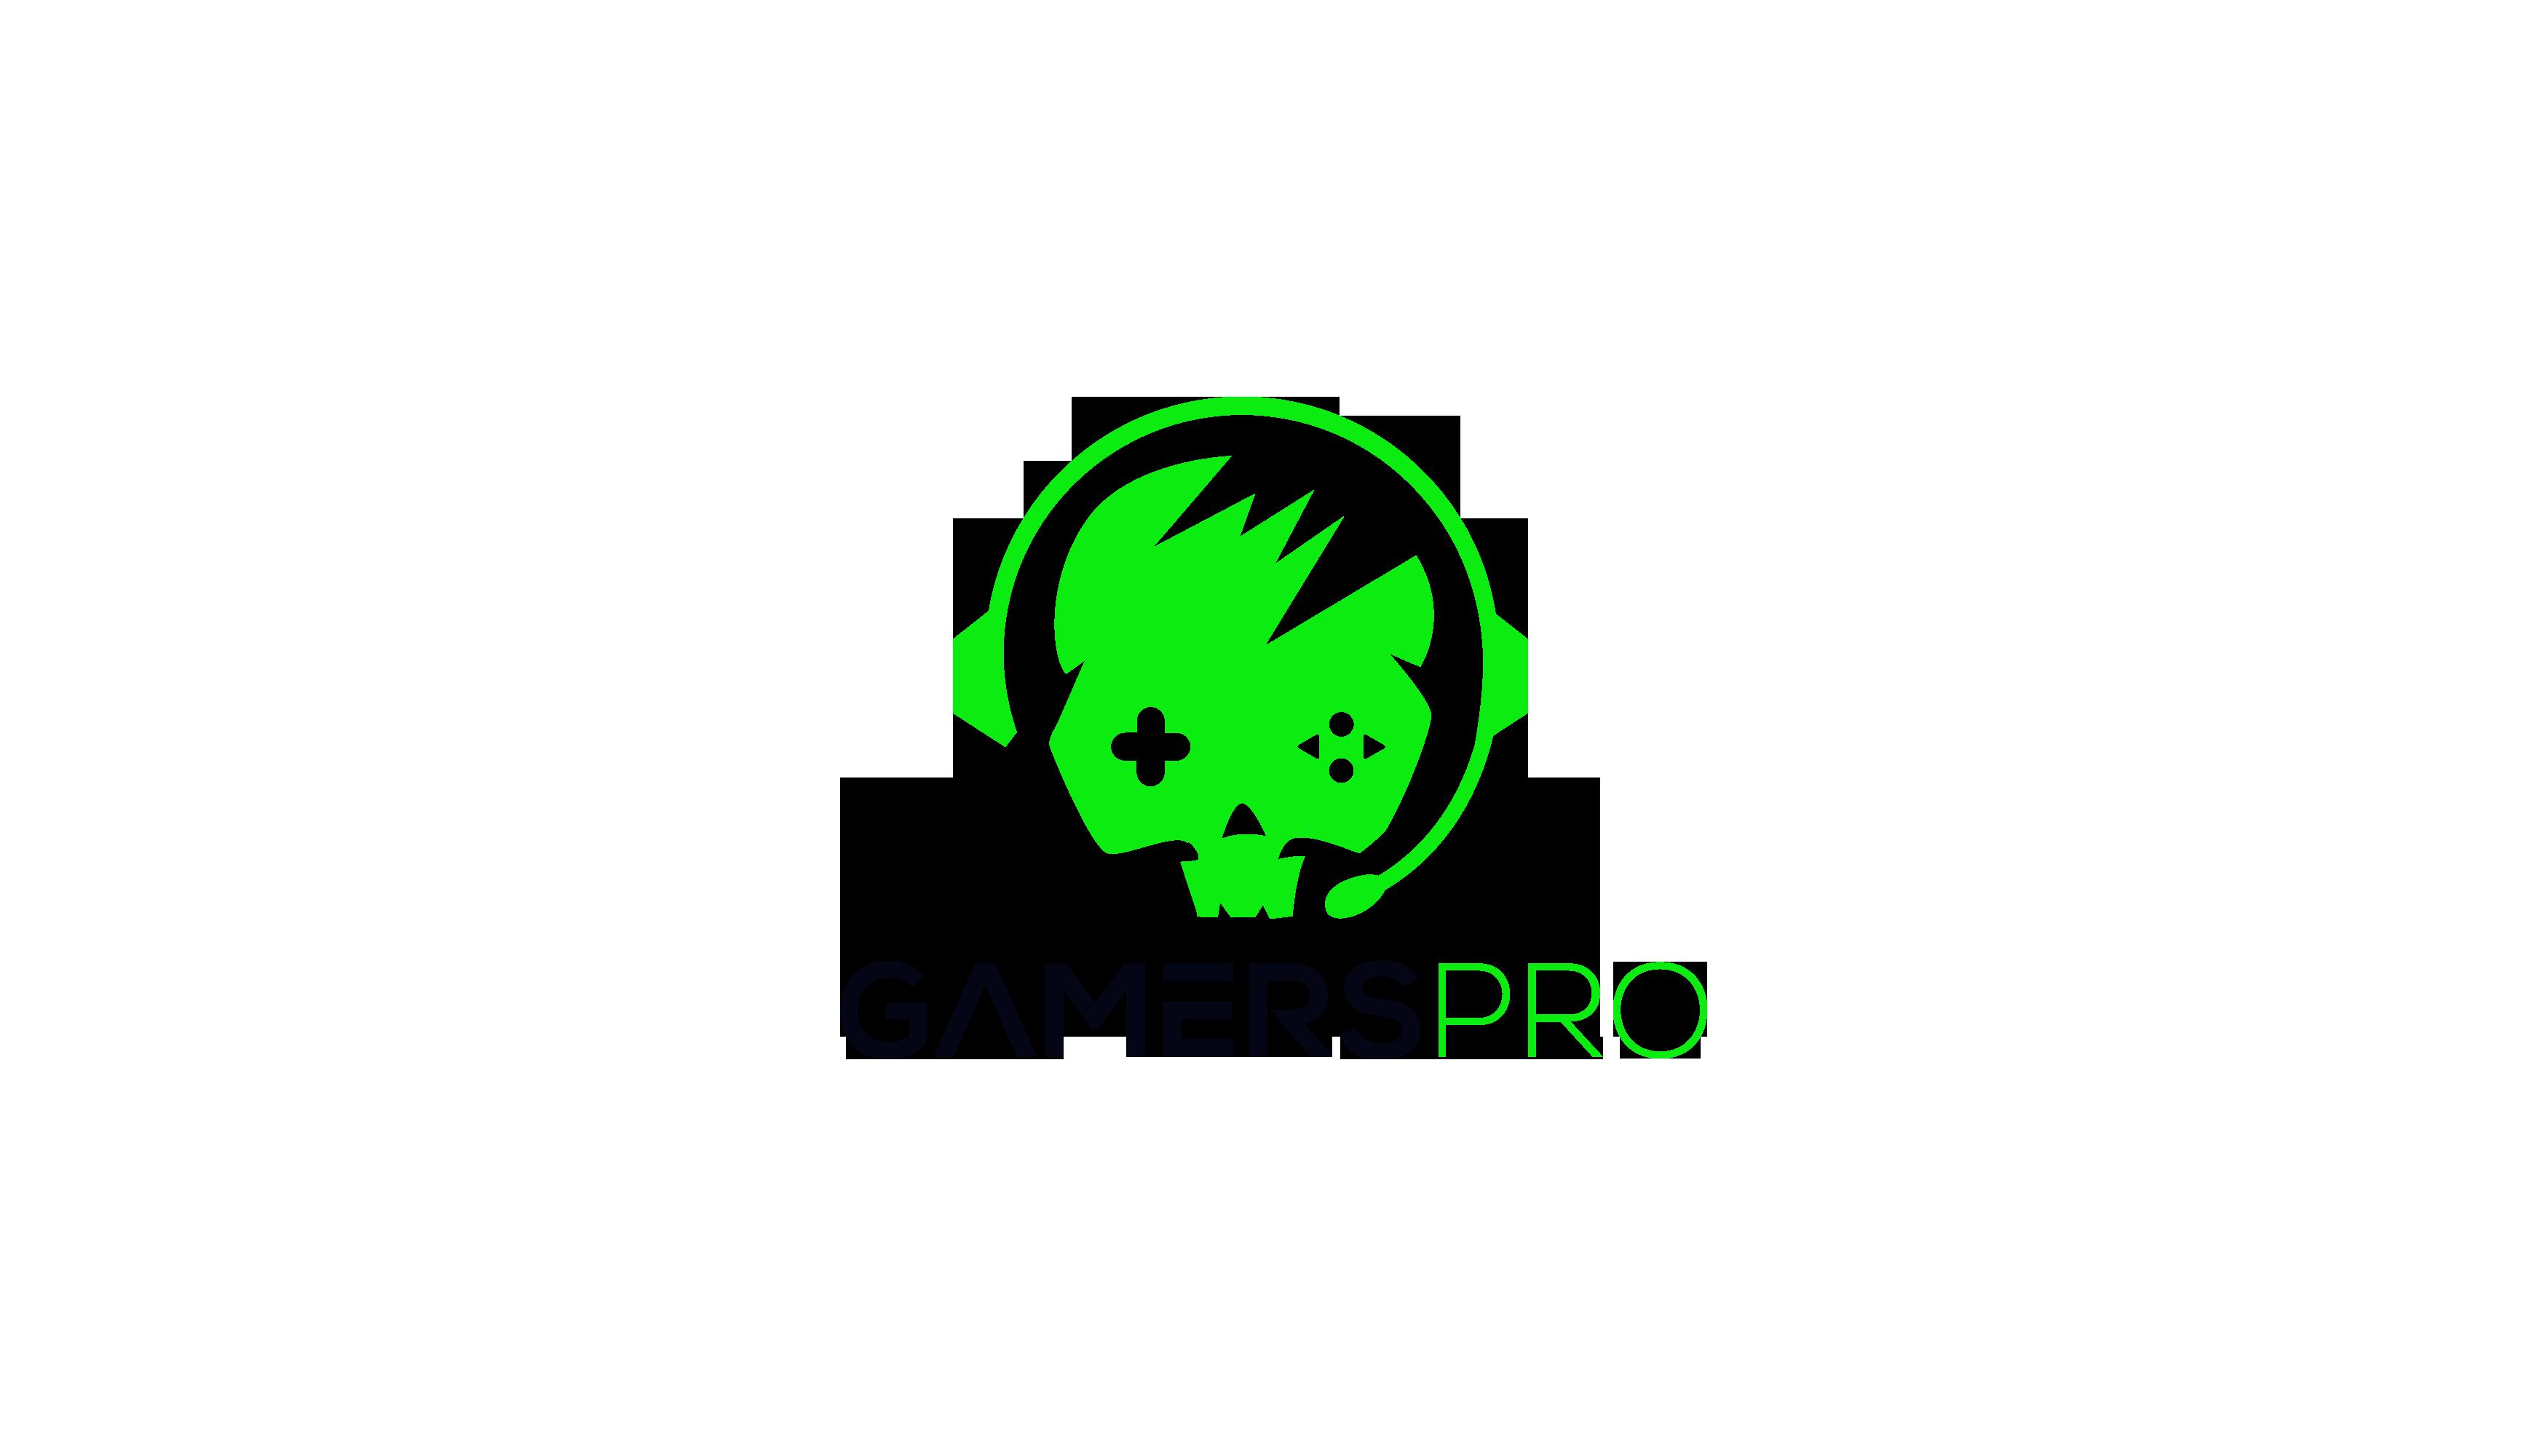 Gamerspro.io